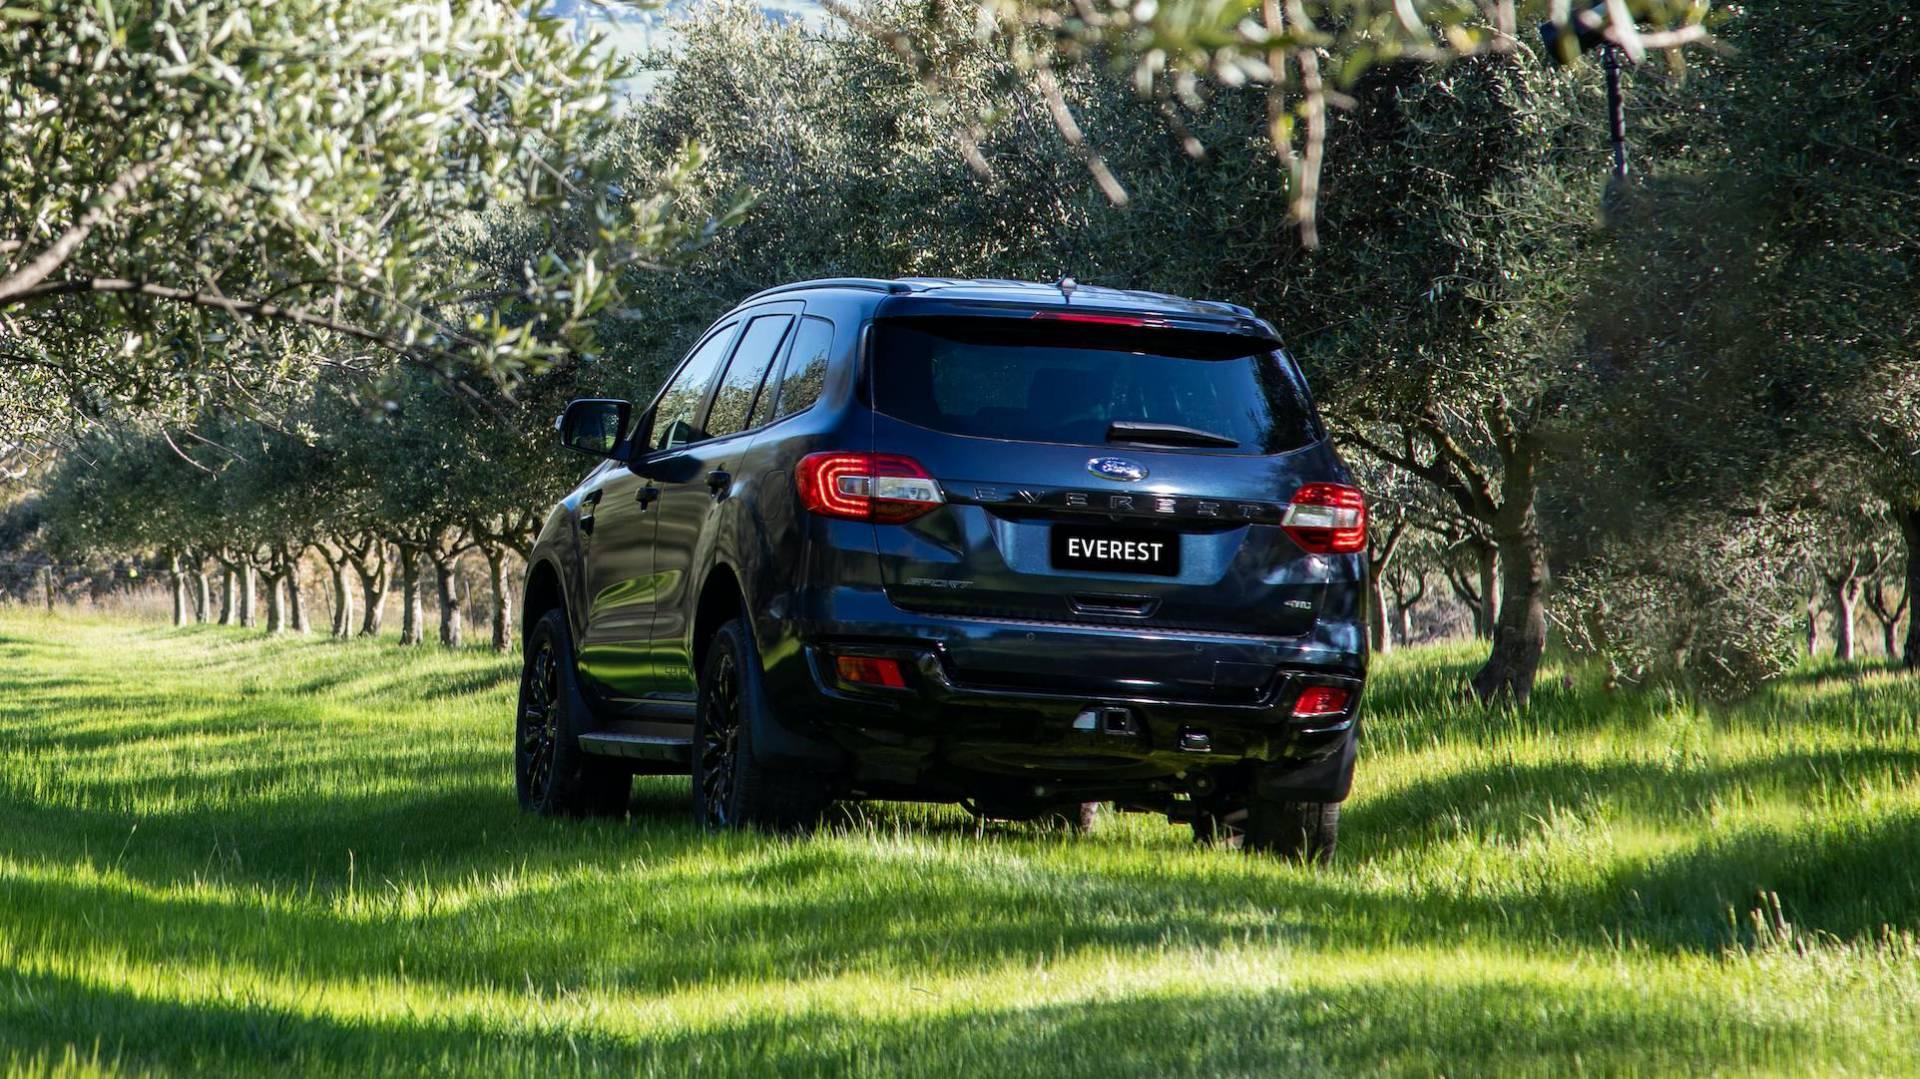 2021 ford everest sport australia spec 3 - Chi tiết Ford Everest Sport 2021 – Phiên bản thể thao cho phái mạnh